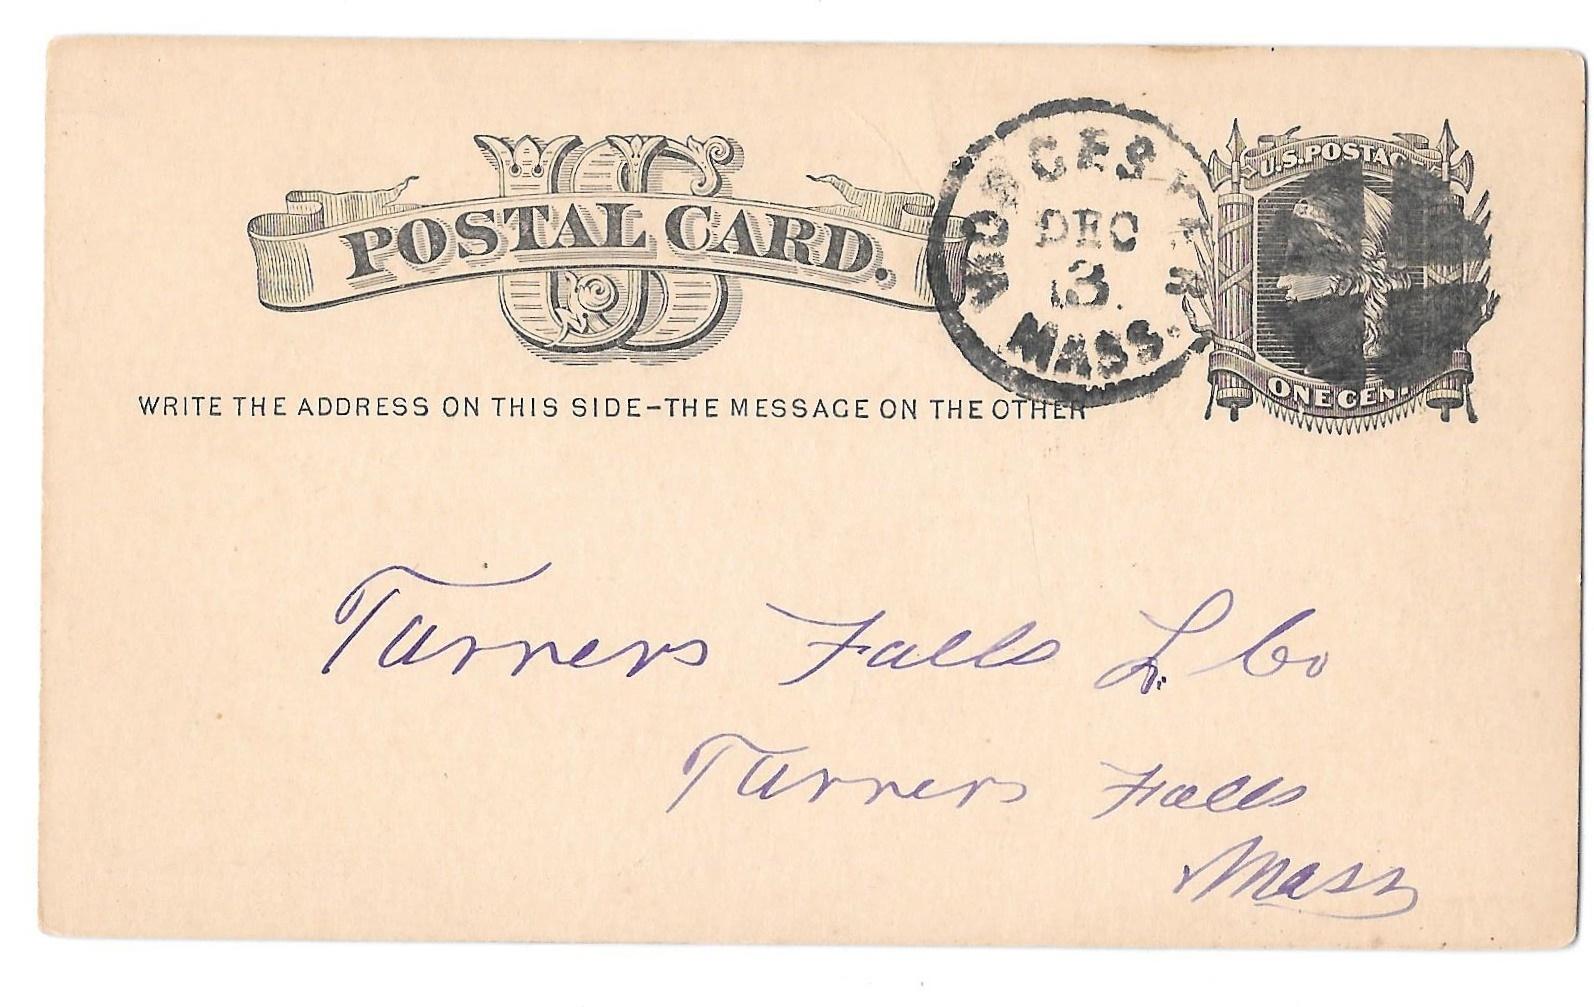 UX5 Worcester Mass 1878 Fancy Cork Cancel Wedges Postal Card